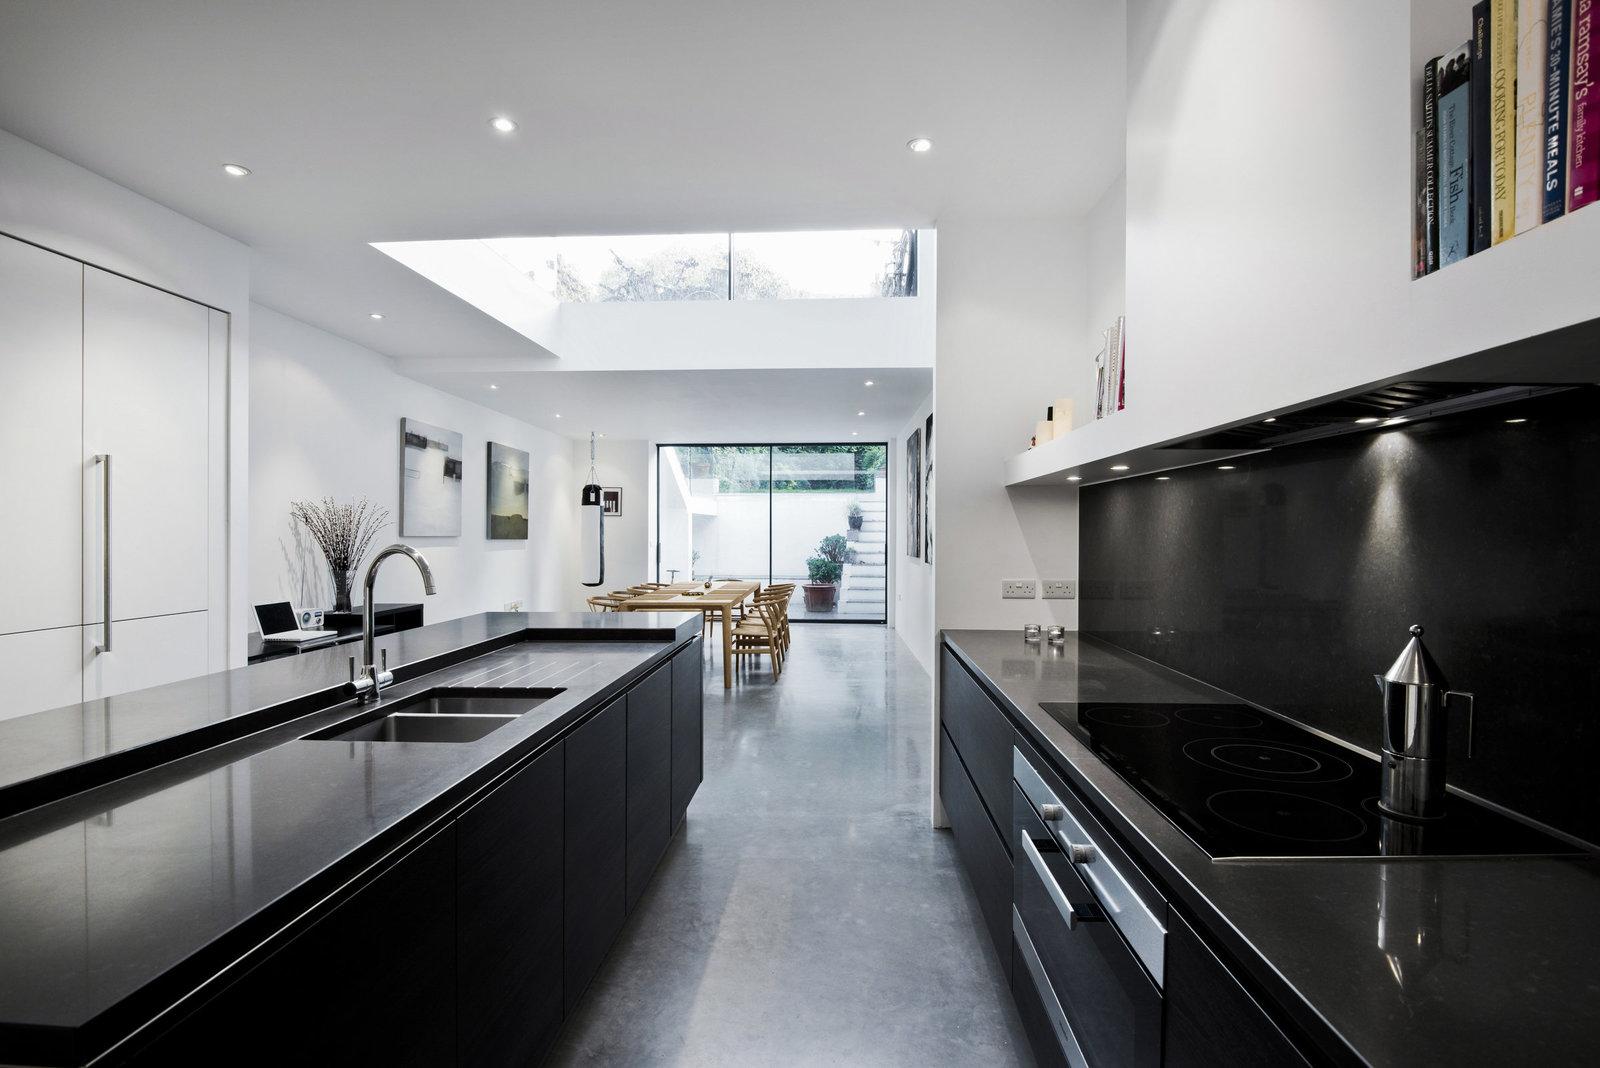 Monochrome Modern Kitche Design London Interior. Bathroom Design London  Interior Photographer